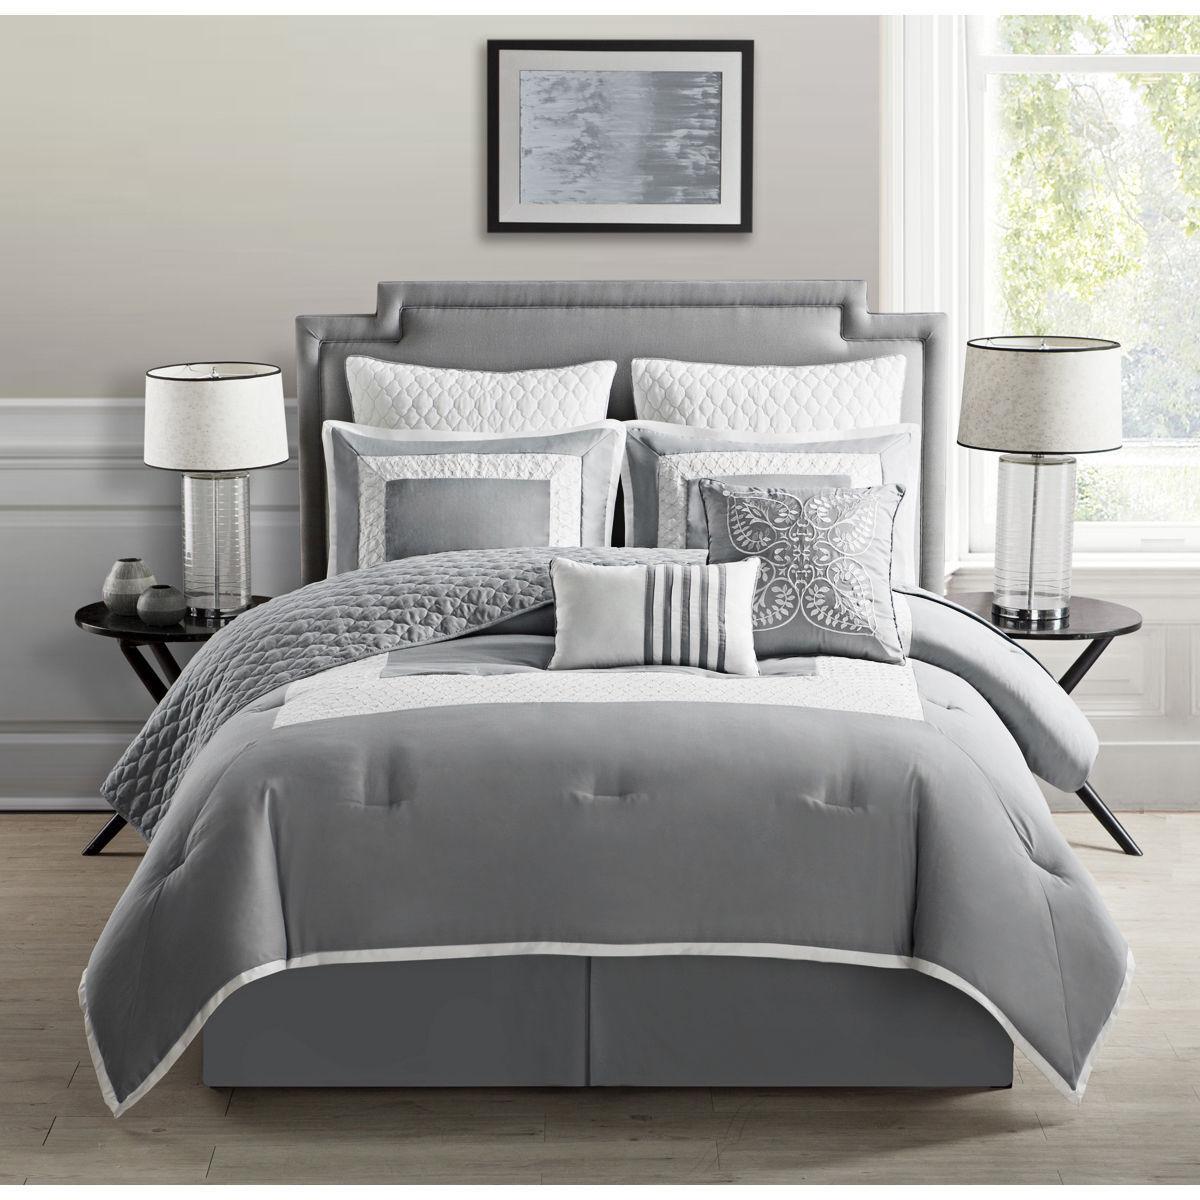 Embroiderot grau Blau Saga Border Design Comforter Coverlet 9 pcs King Queen set